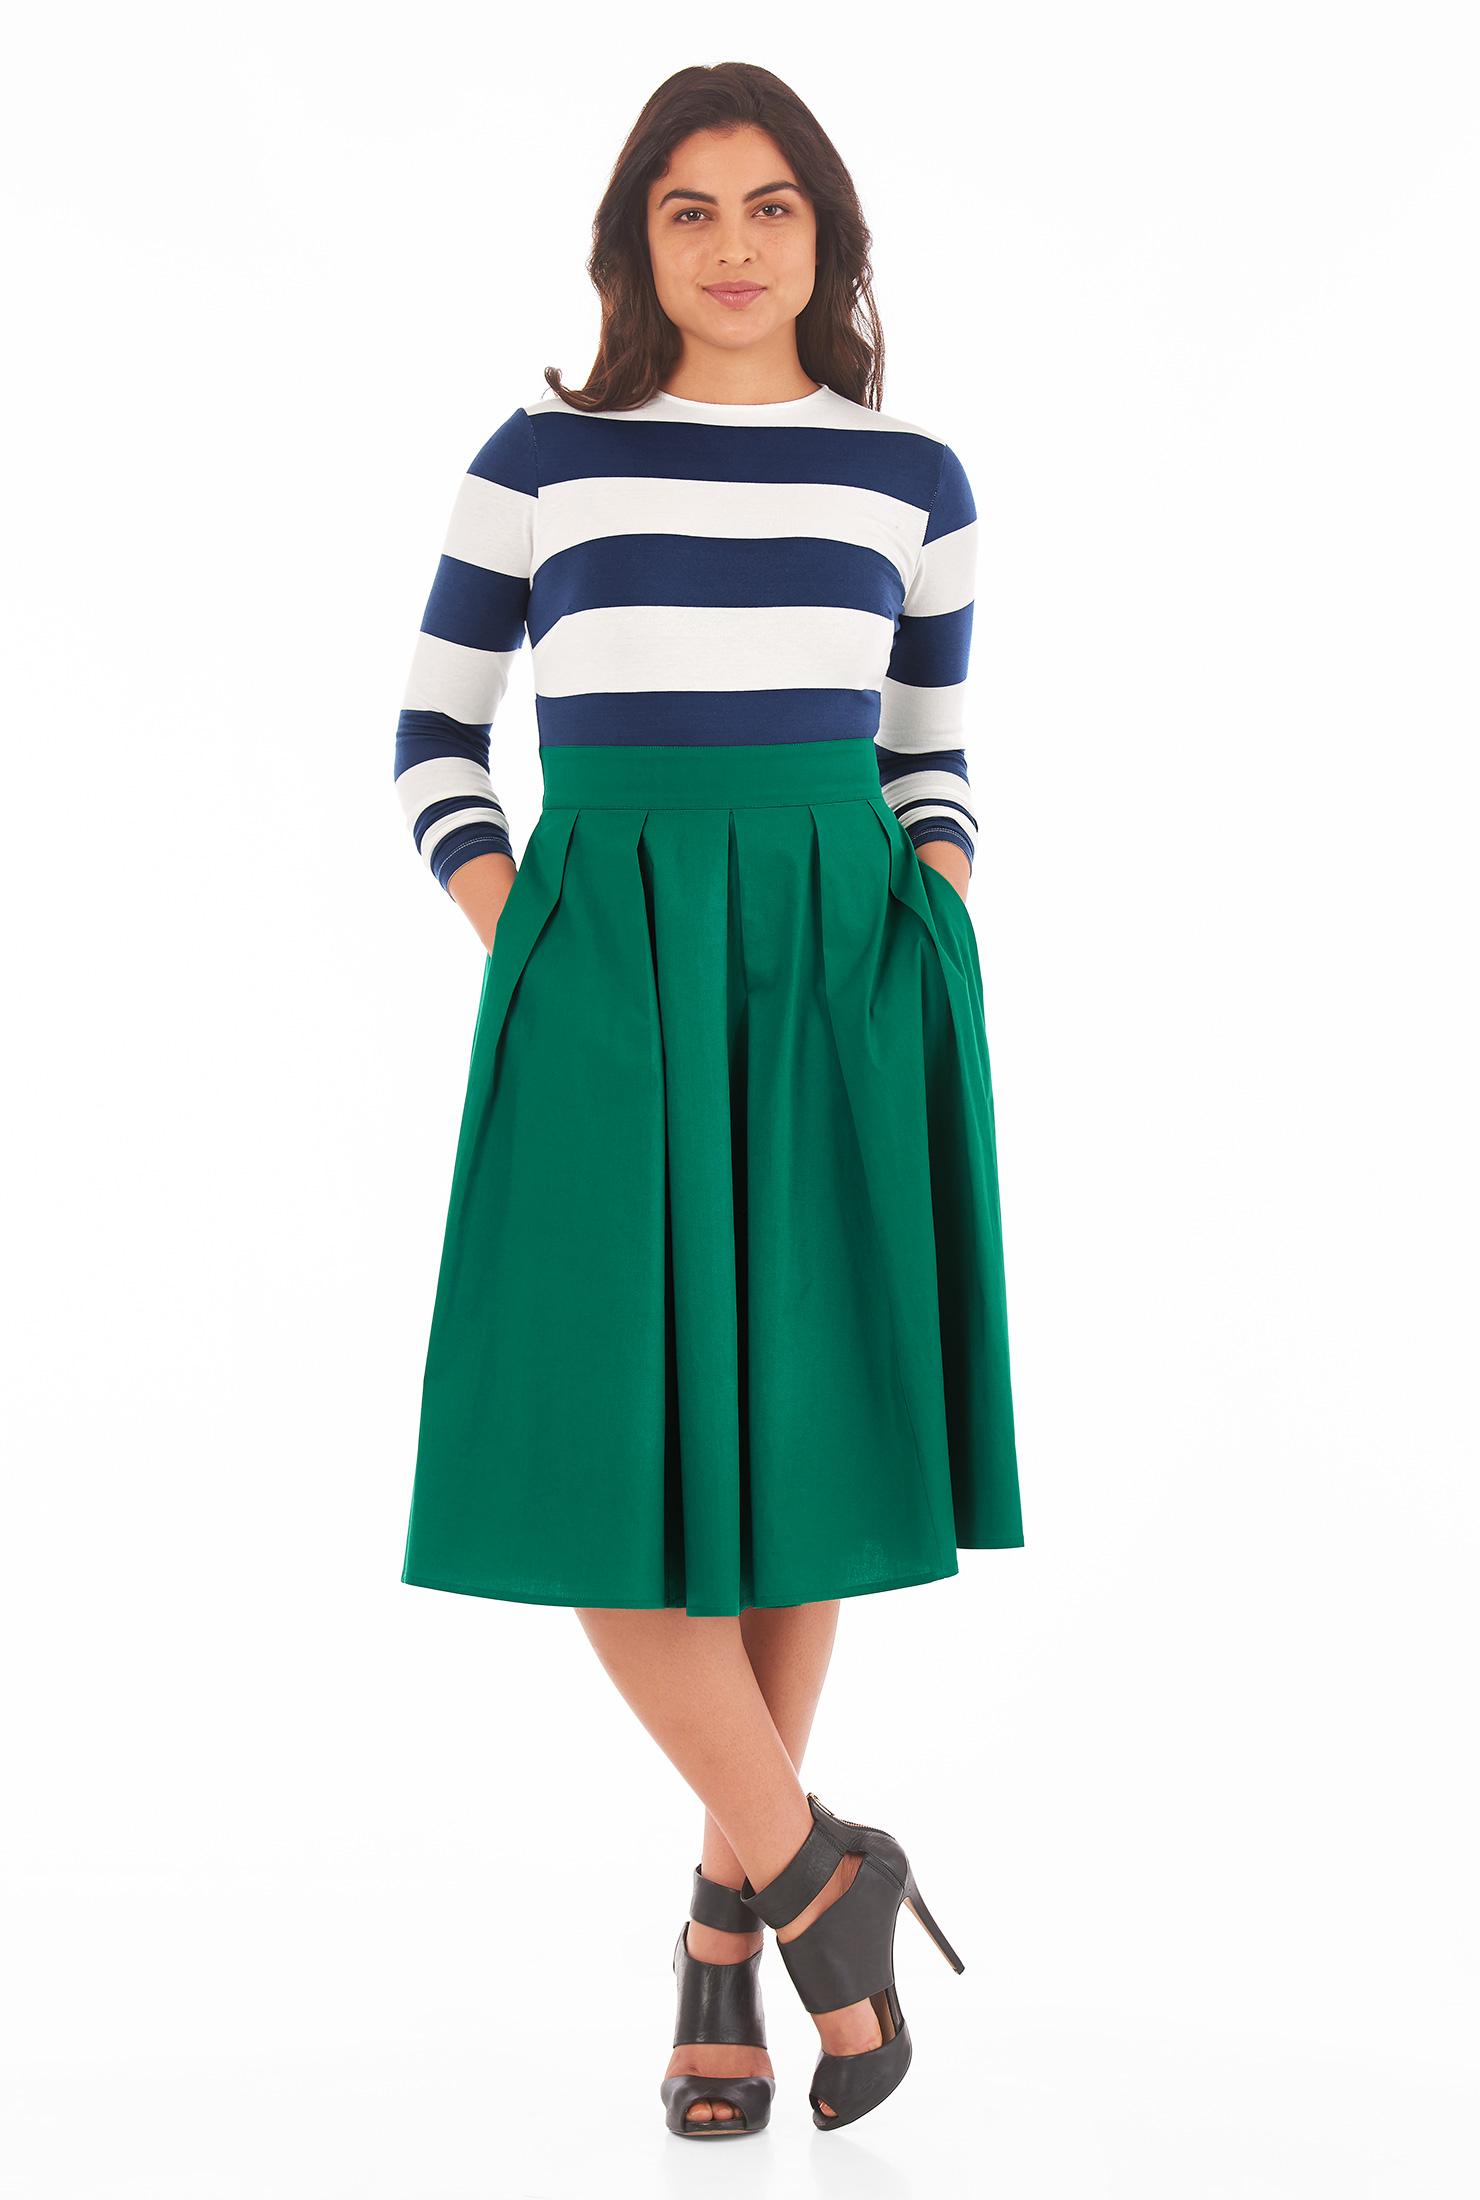 eShakti Women's Mixed media stripe cotton knit dress CL0051739